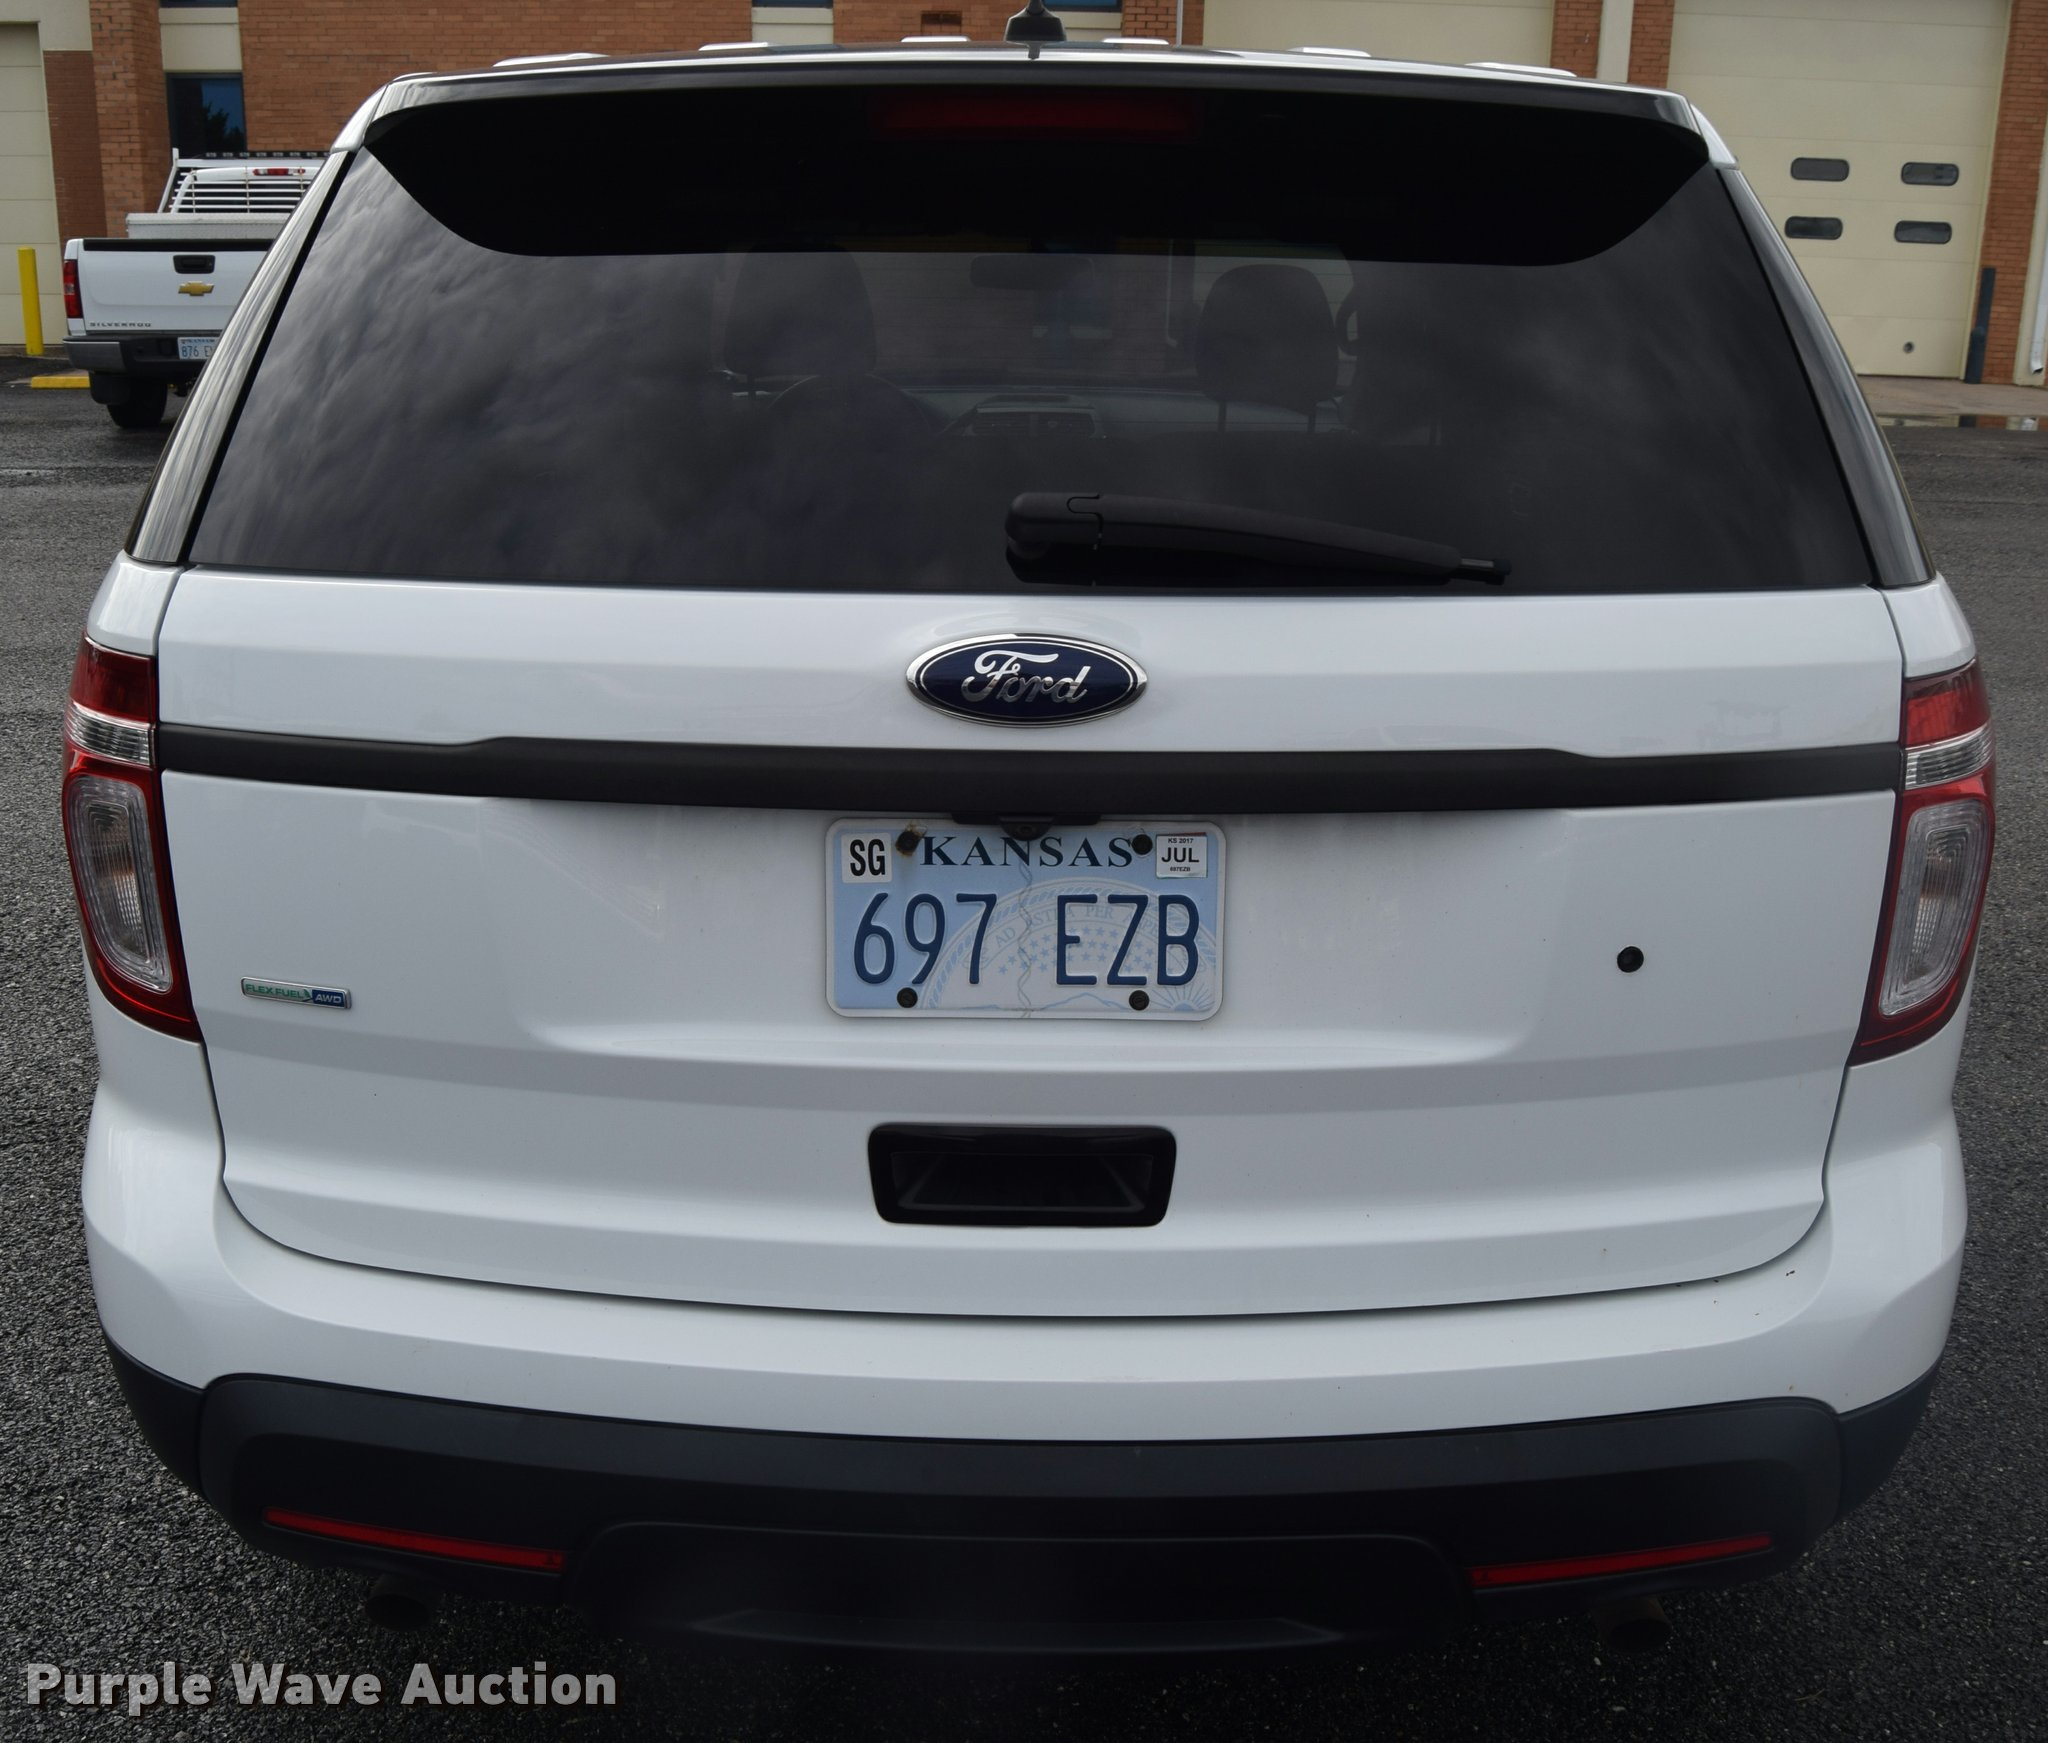 2013 Ford Explorer Police Interceptor Utility SUV